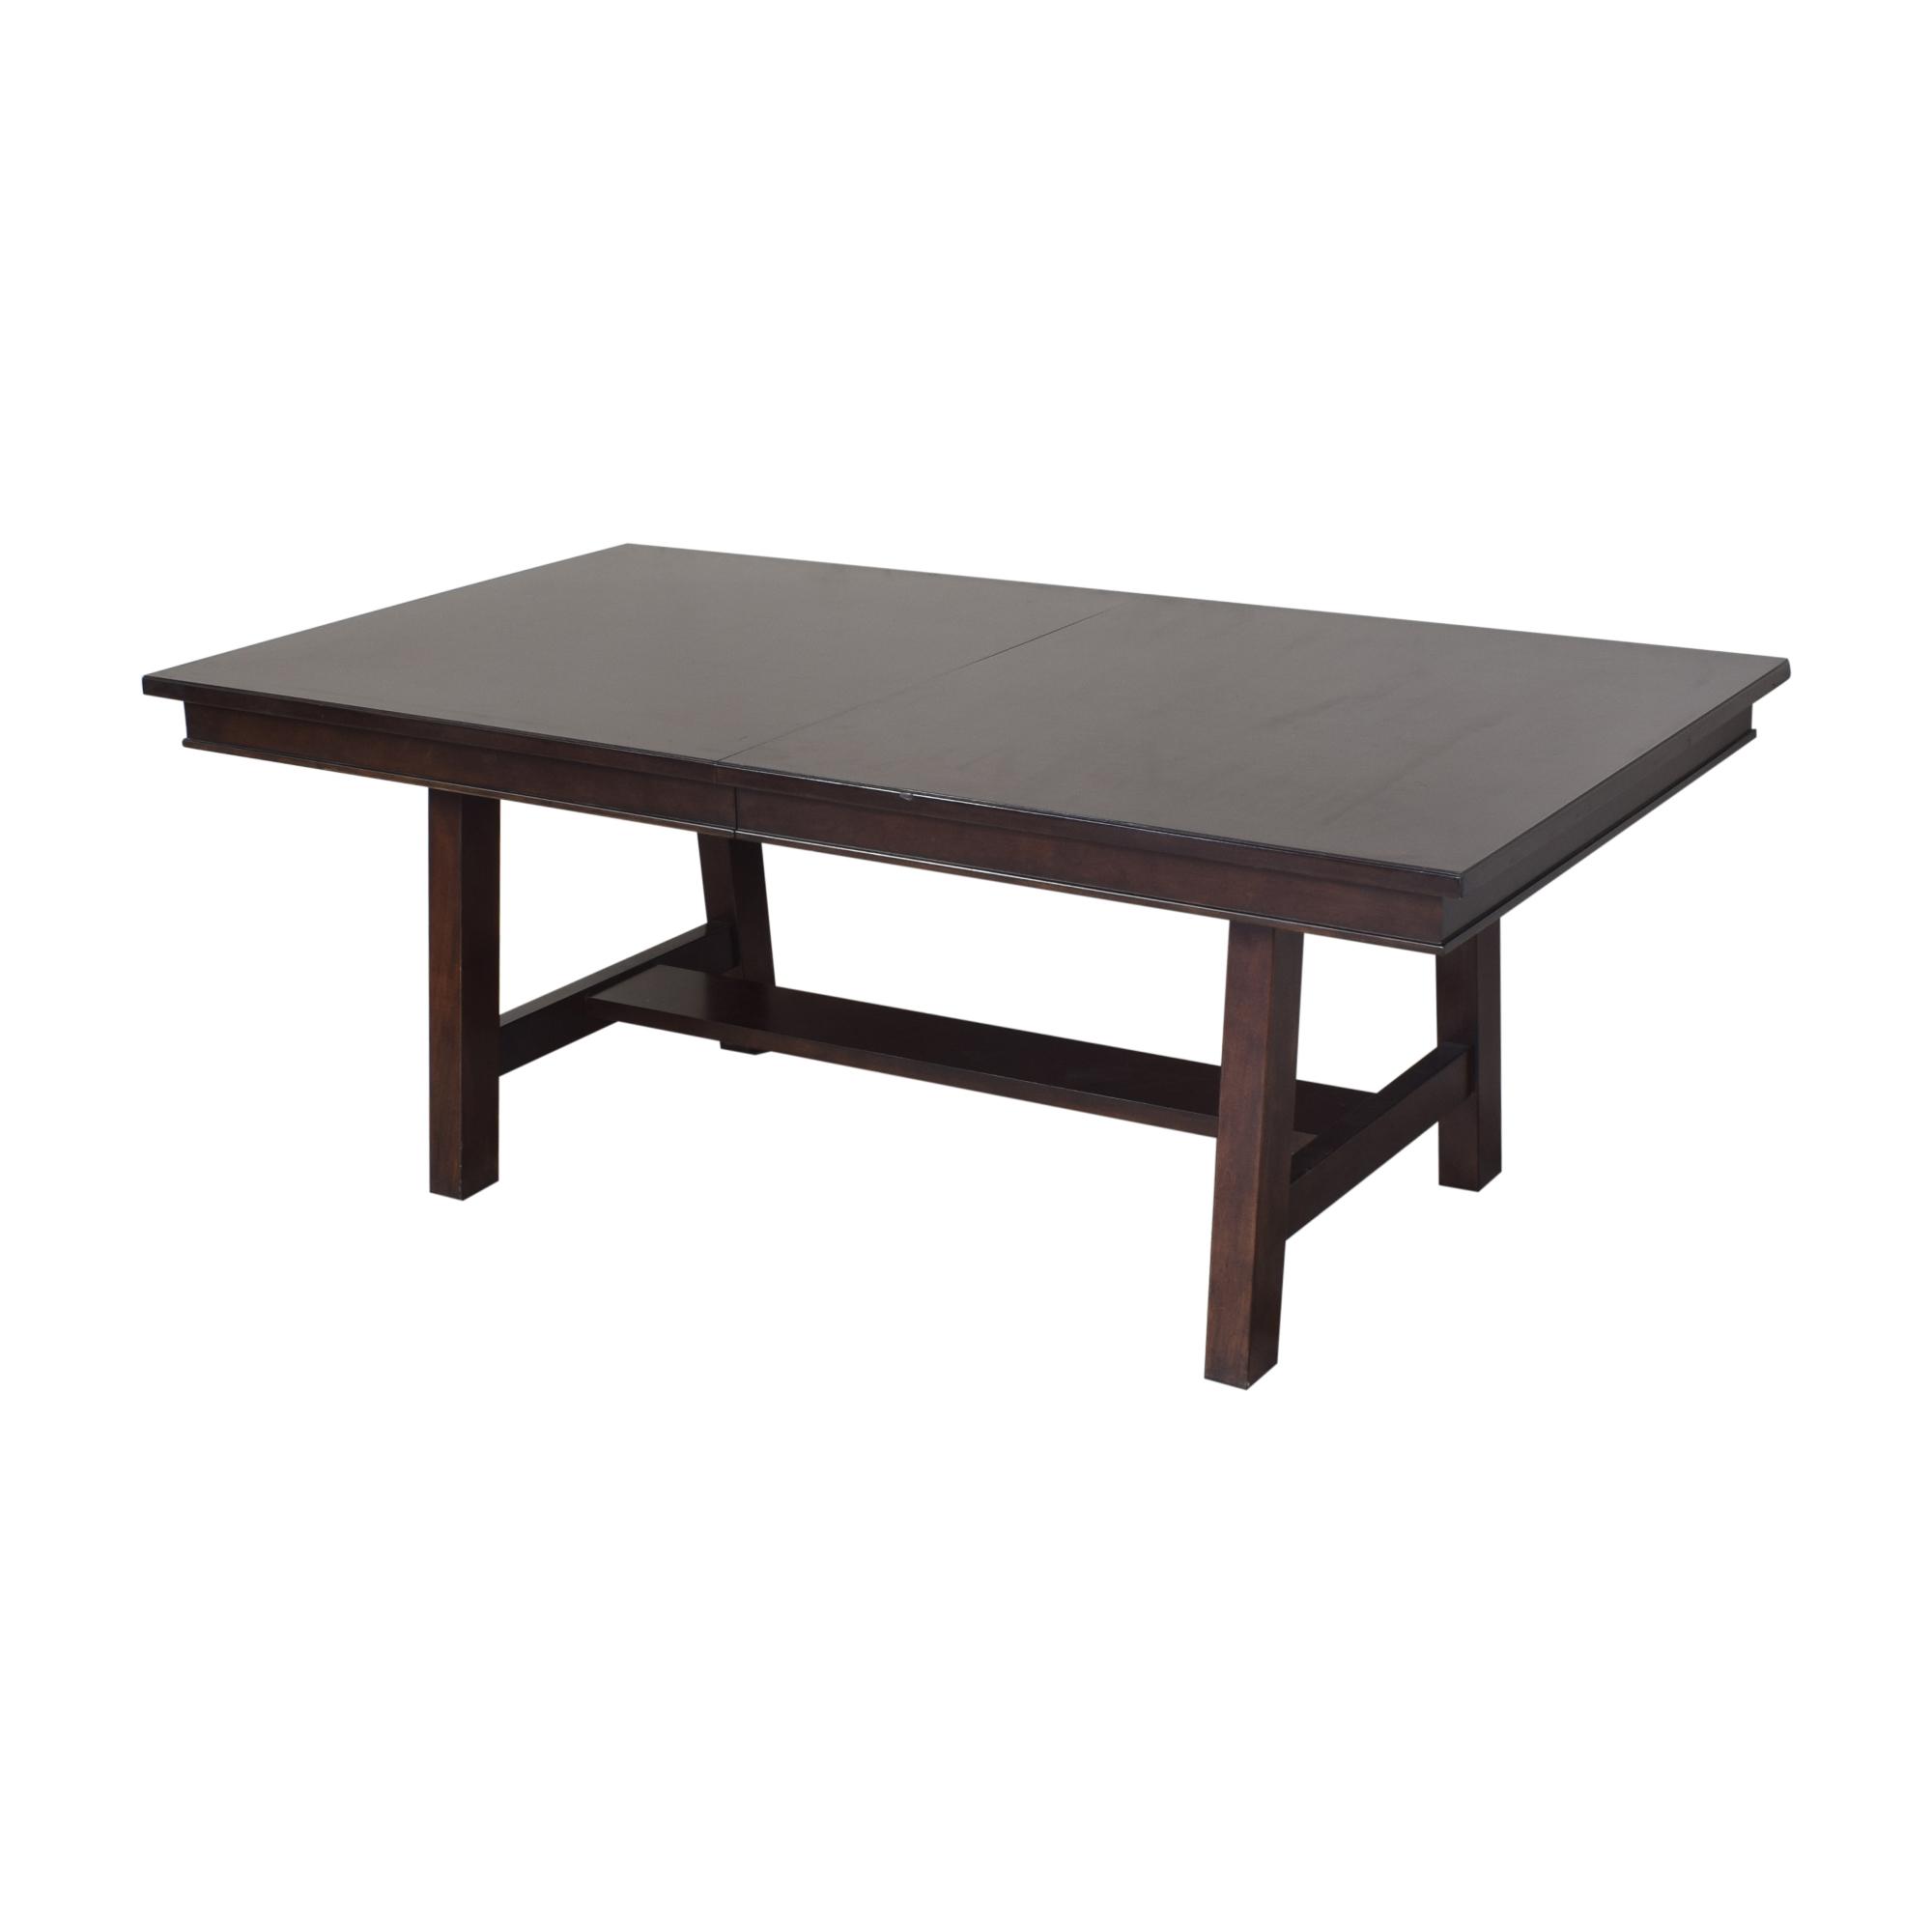 shop  Extendable Trestle Dining Table online